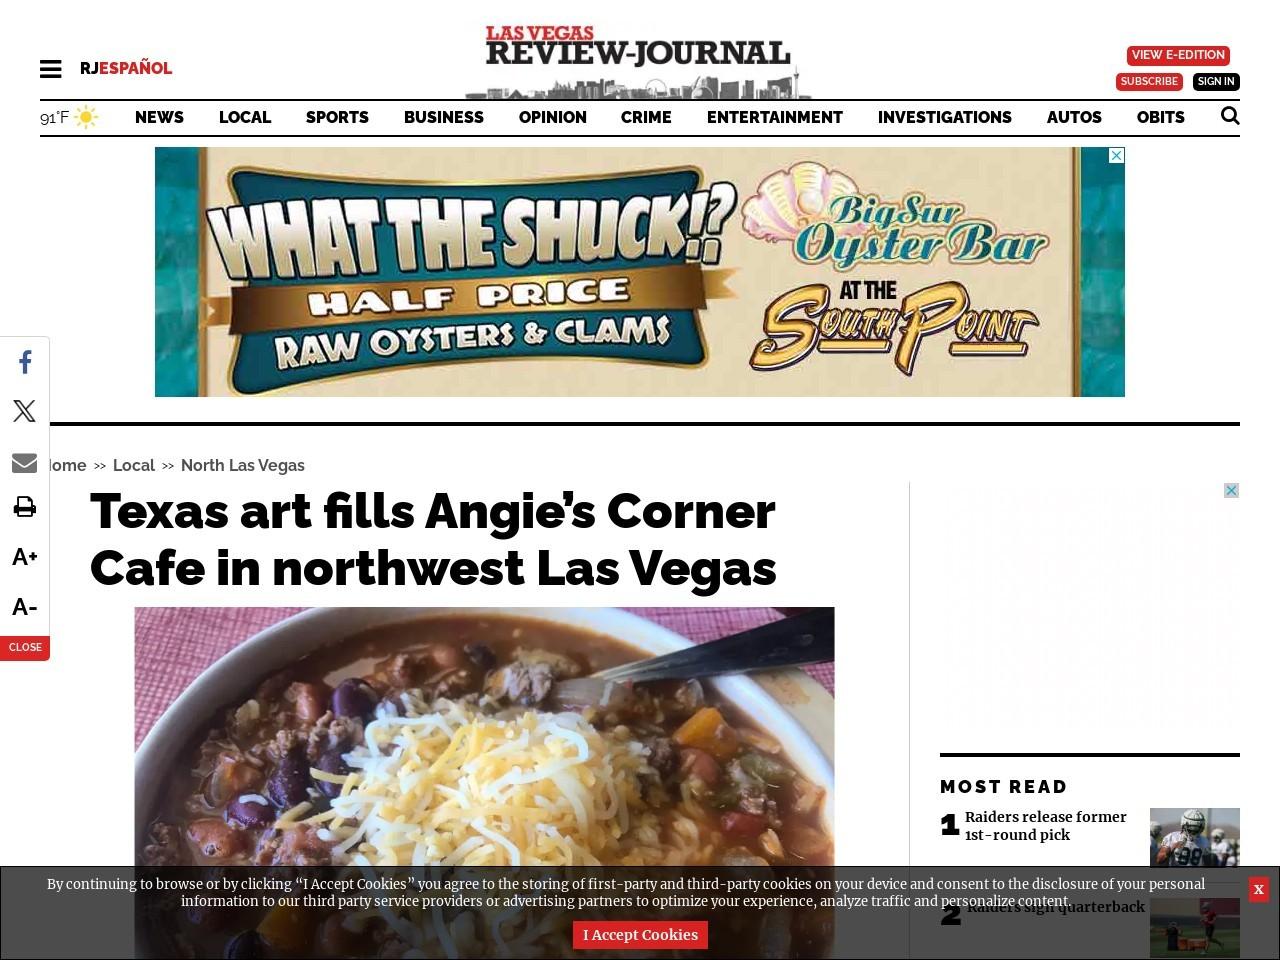 Texas art fills Angie's Corner Cafe in northwest Las Vegas